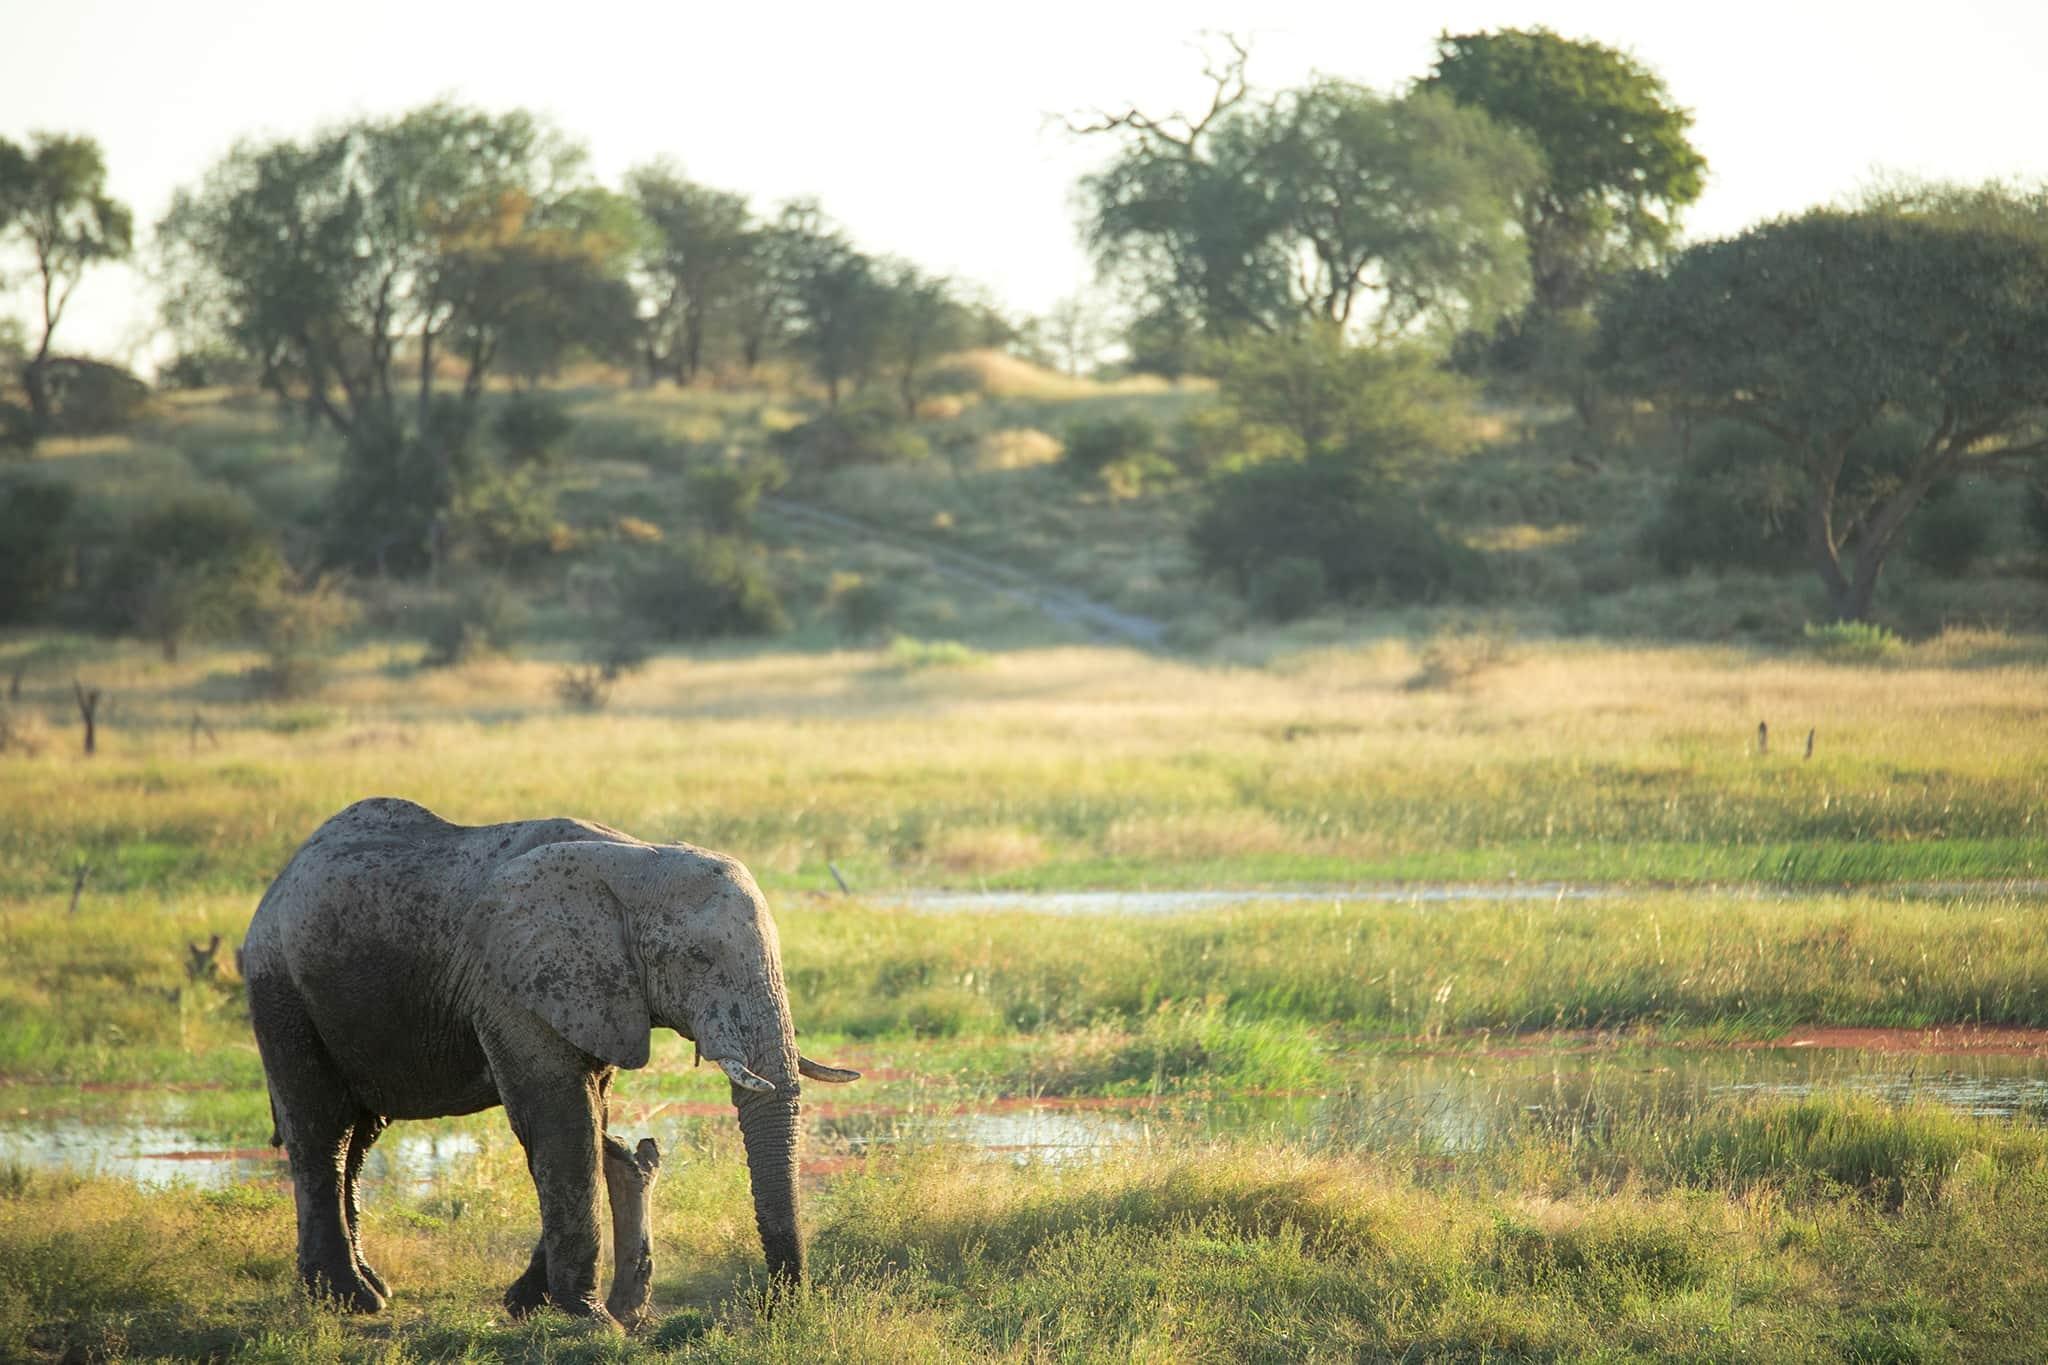 botswana moremi okovango delta elephant trees grass water